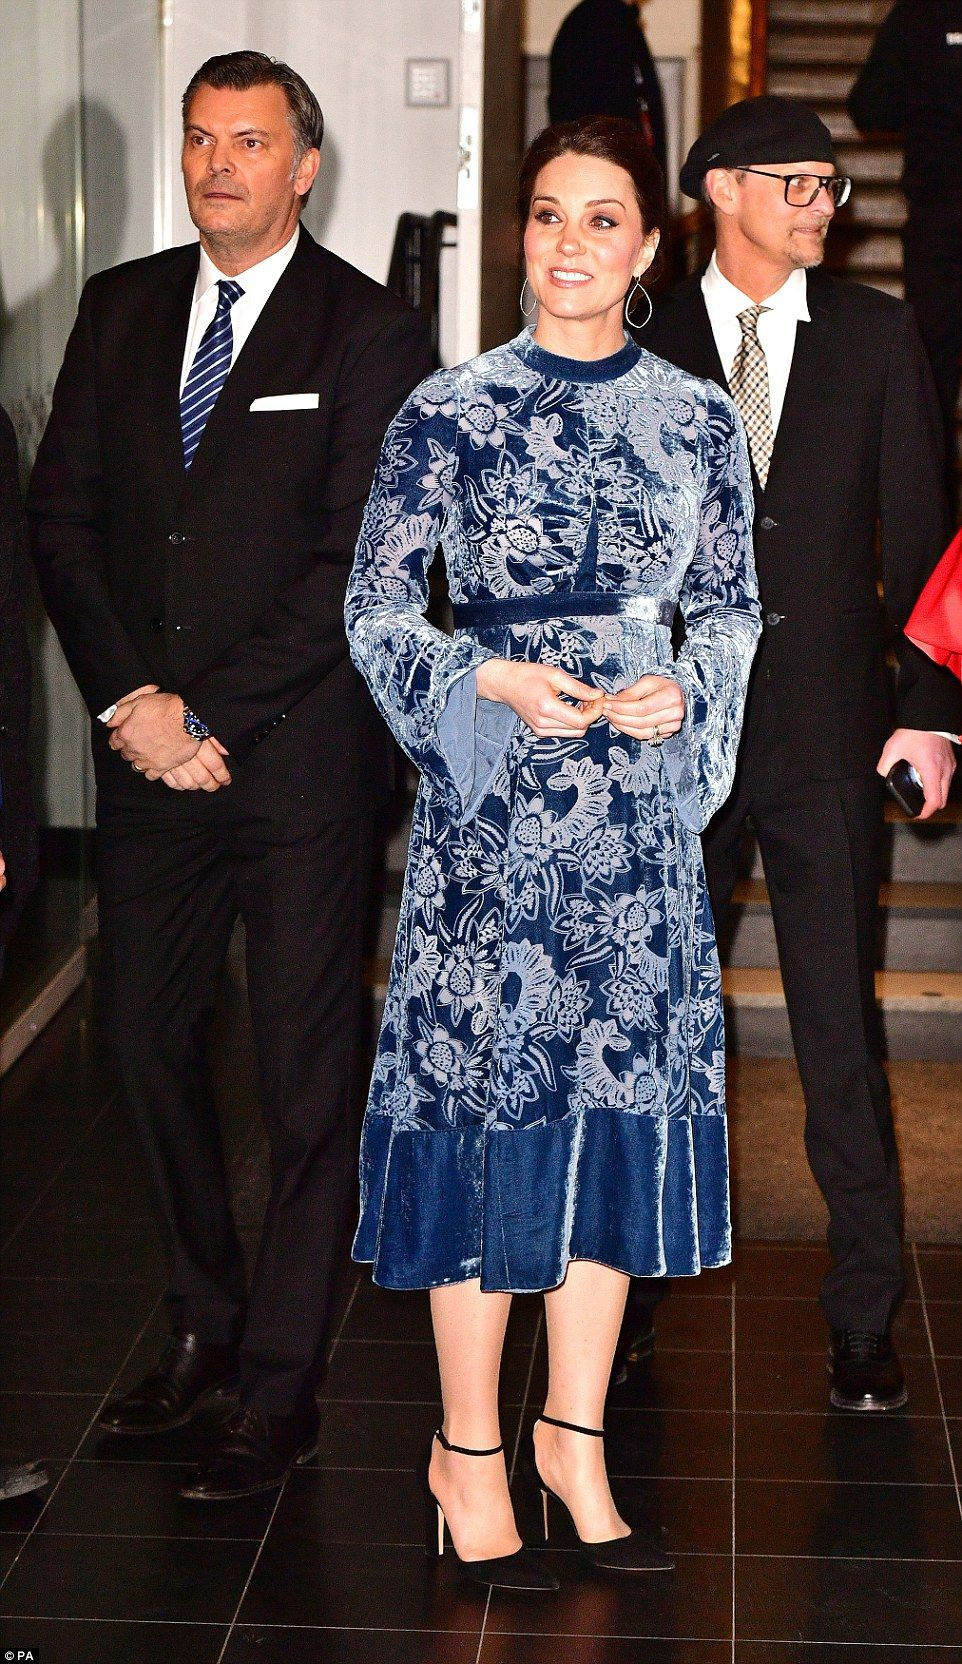 foto Pippa Middleton wows at yet another glamorous wedding